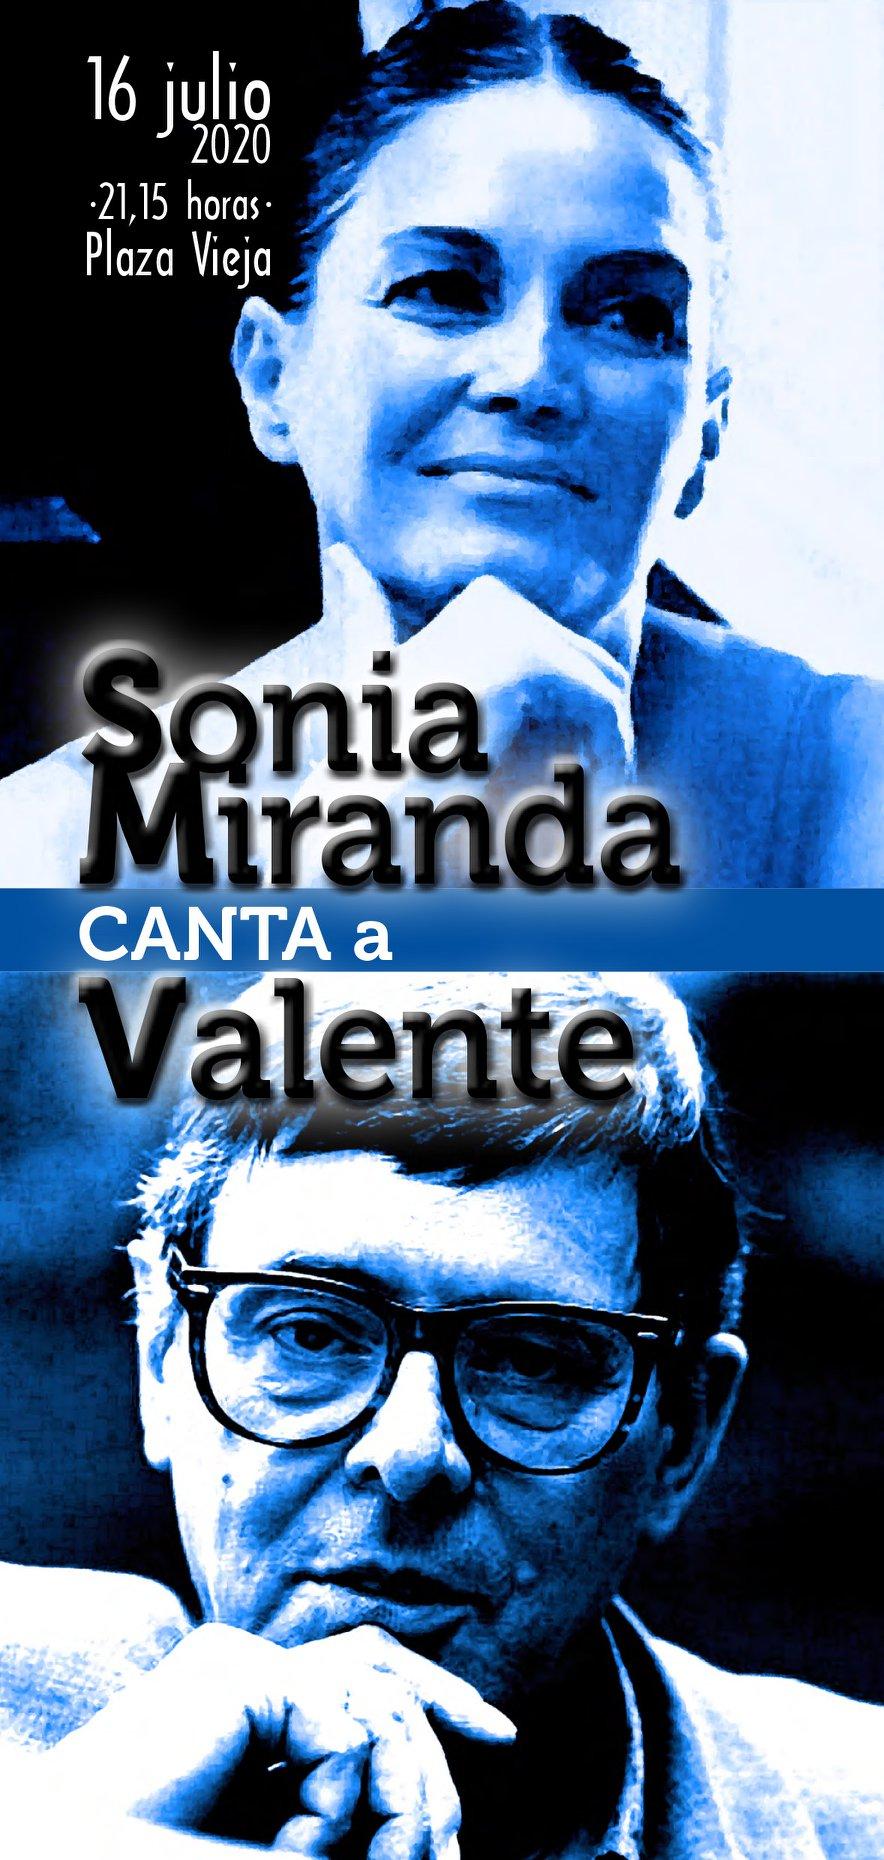 Sonia Miranda canta a Valente